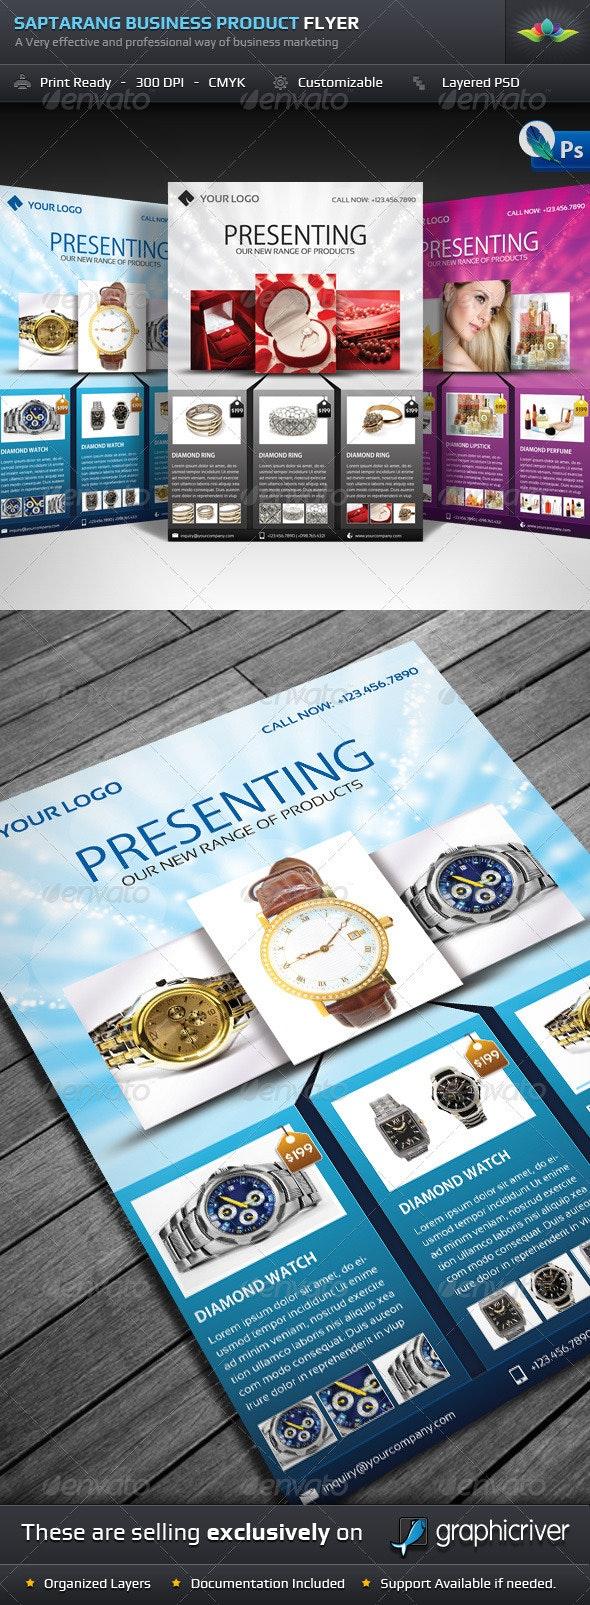 Saptarang Business Product Flyer - Commerce Flyers